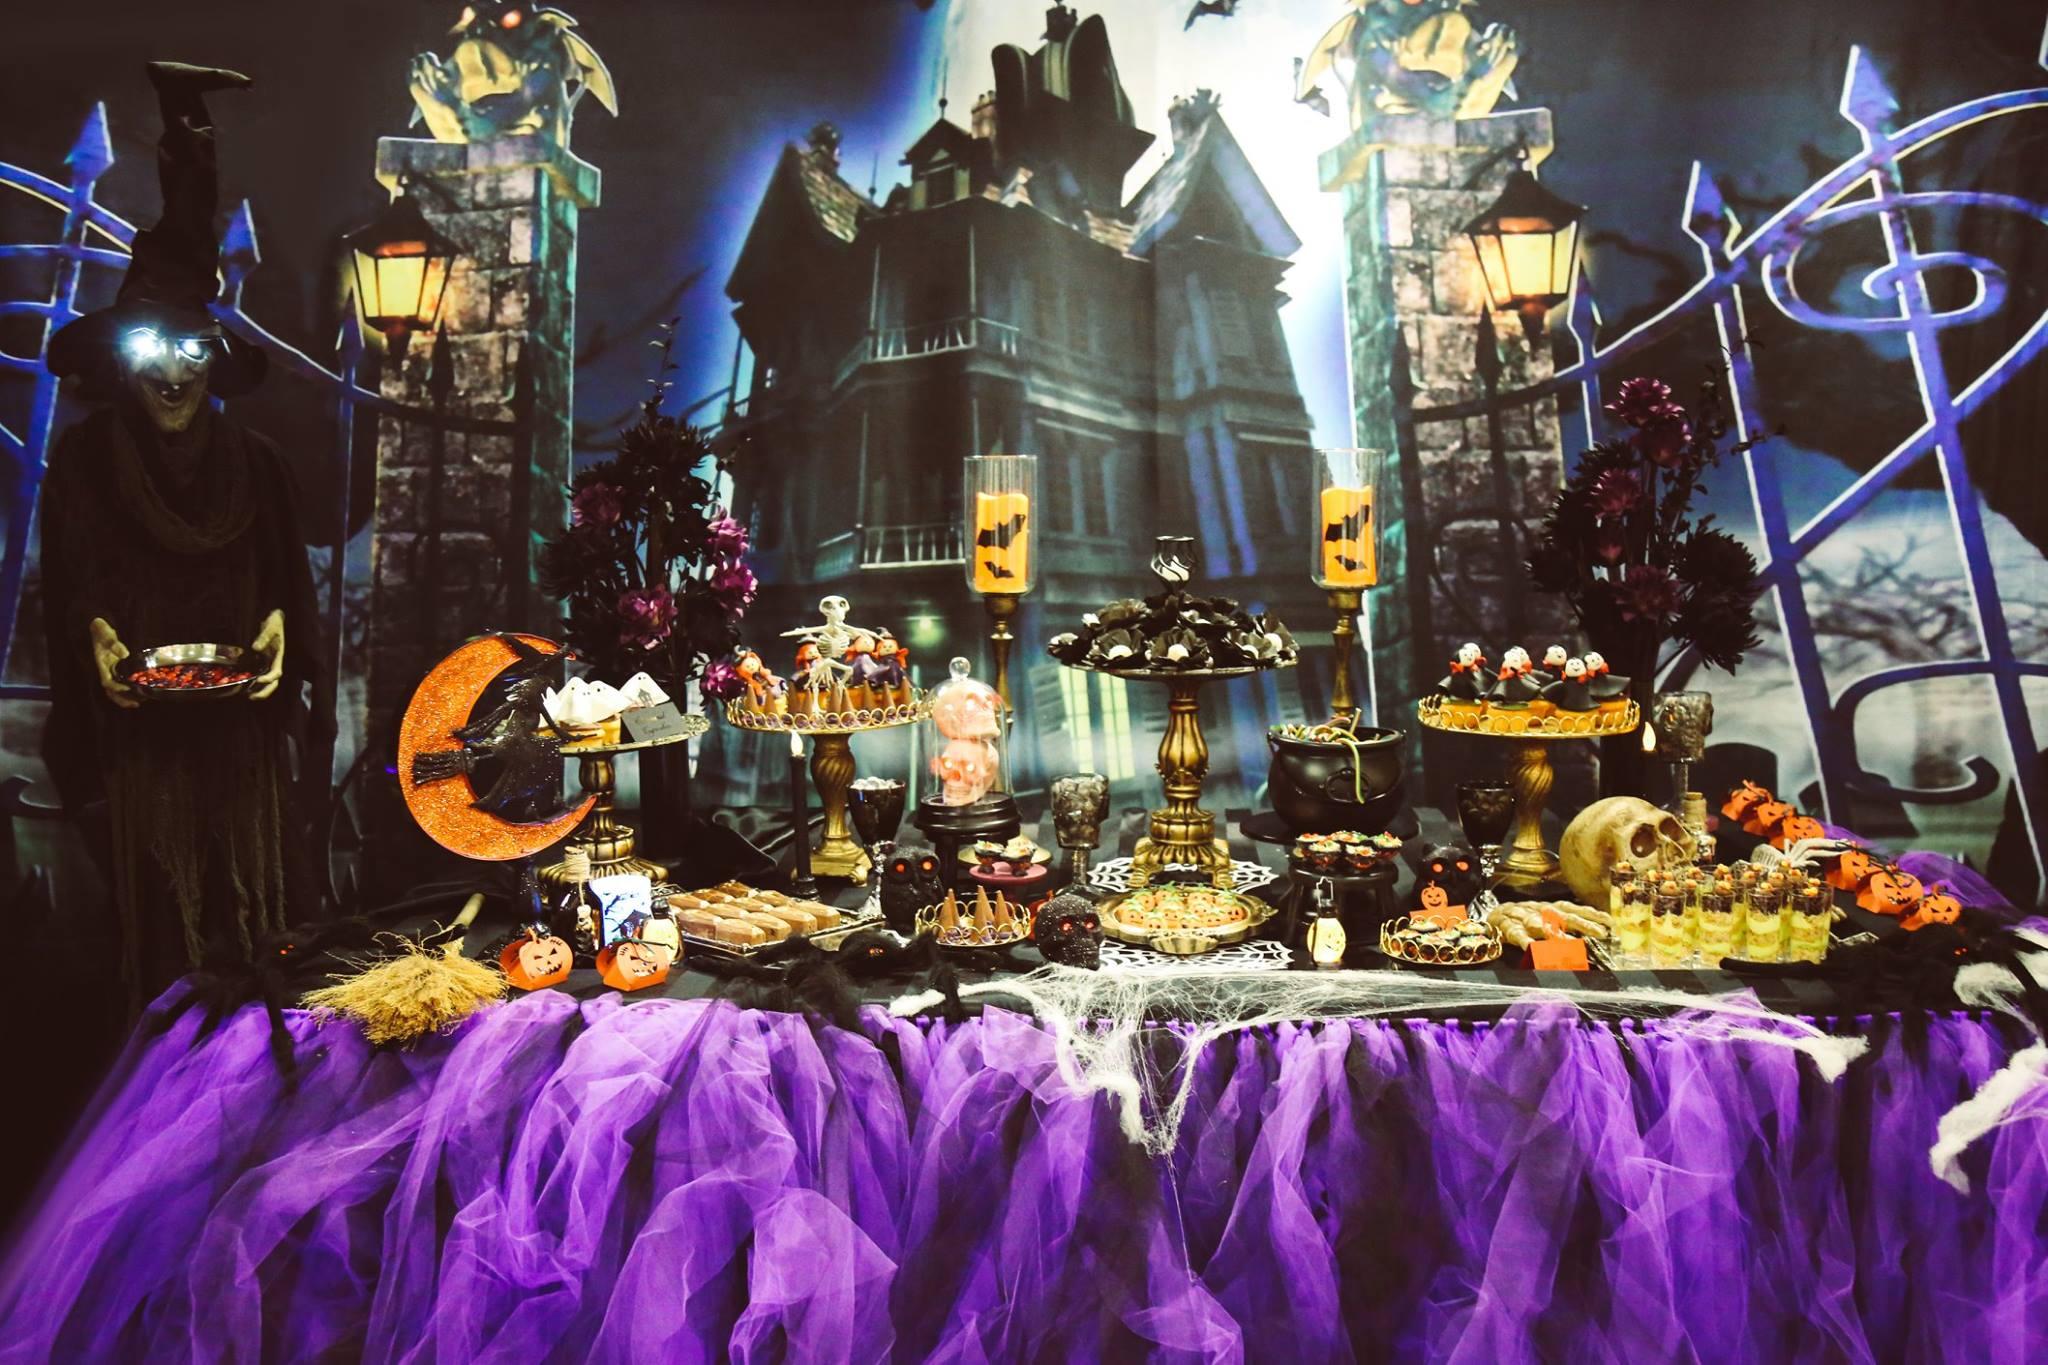 décoration halloween belle formation